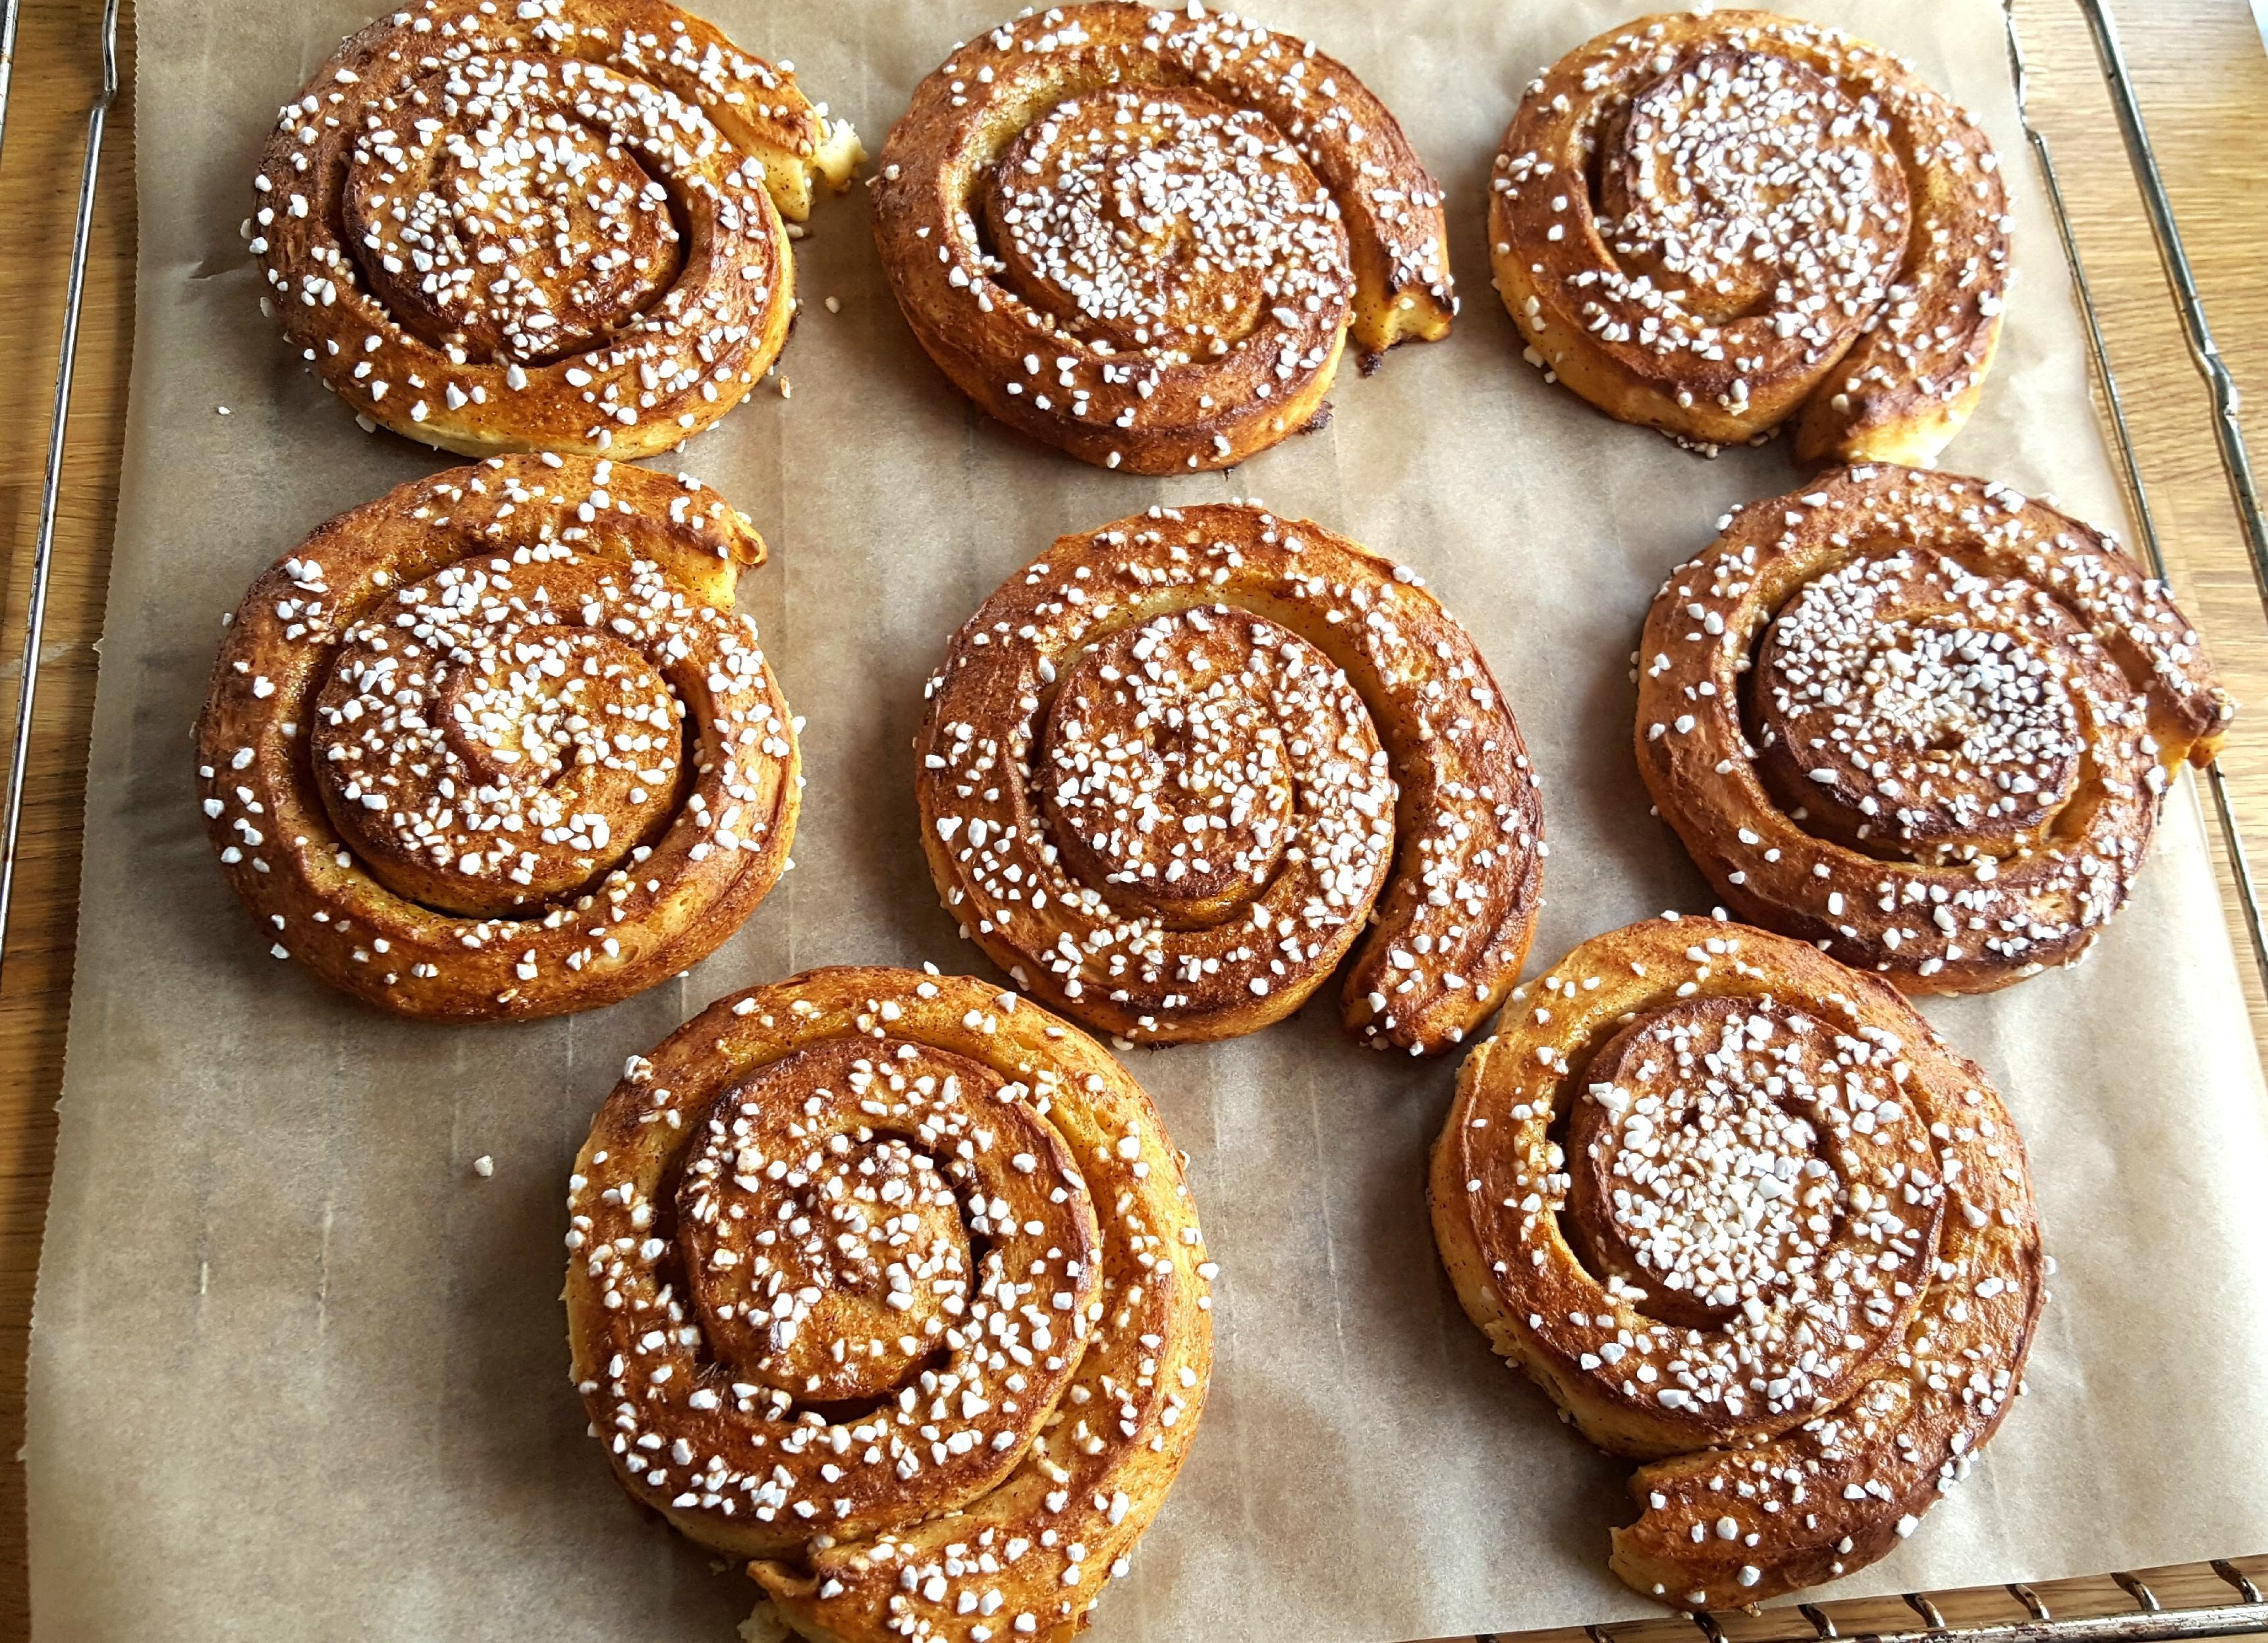 Homemade] Swedish cinnamon rolls! | My favourites | Pinterest